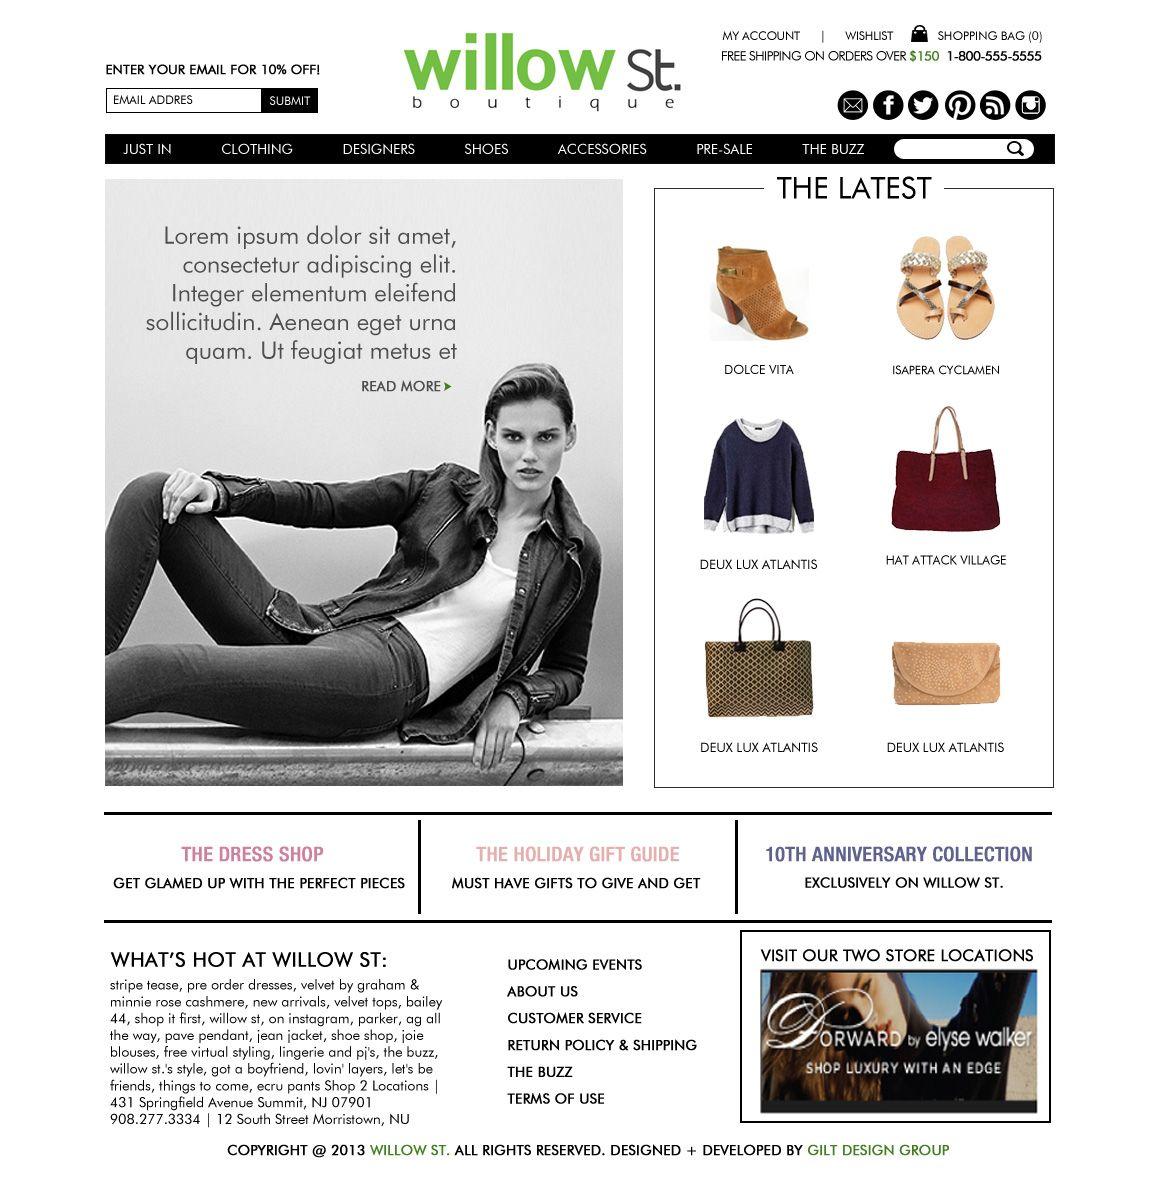 Modern Web Design, Small Business Website Design, Volusion Web Designer, Creative Web Designers, Professional Website Design, Small Business Web Design